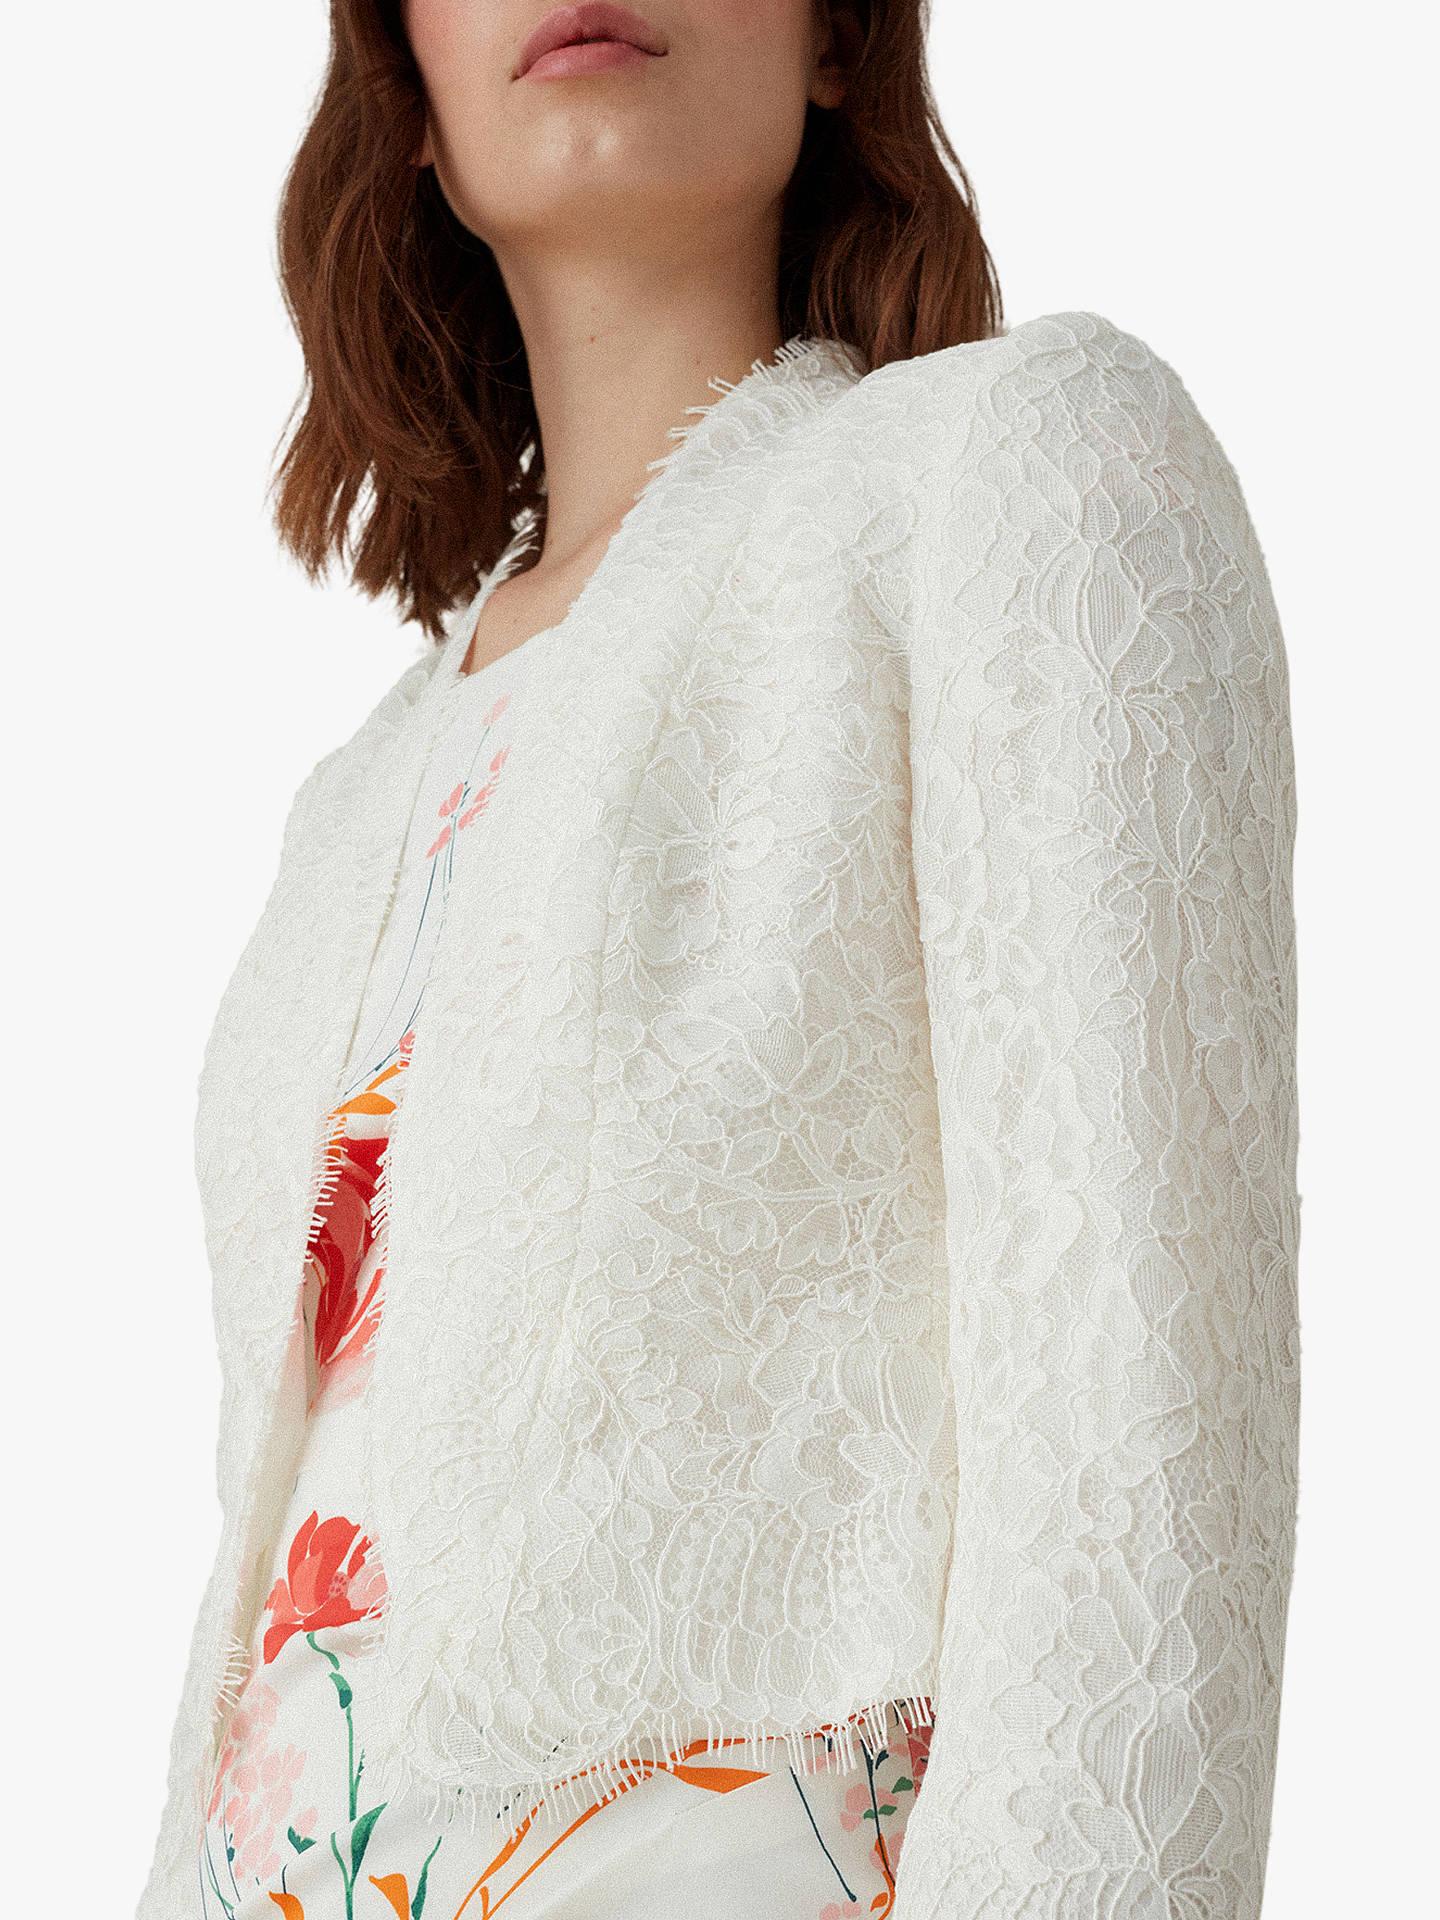 c74e014de2e Buy Karen Millen Lace Open Cardigan